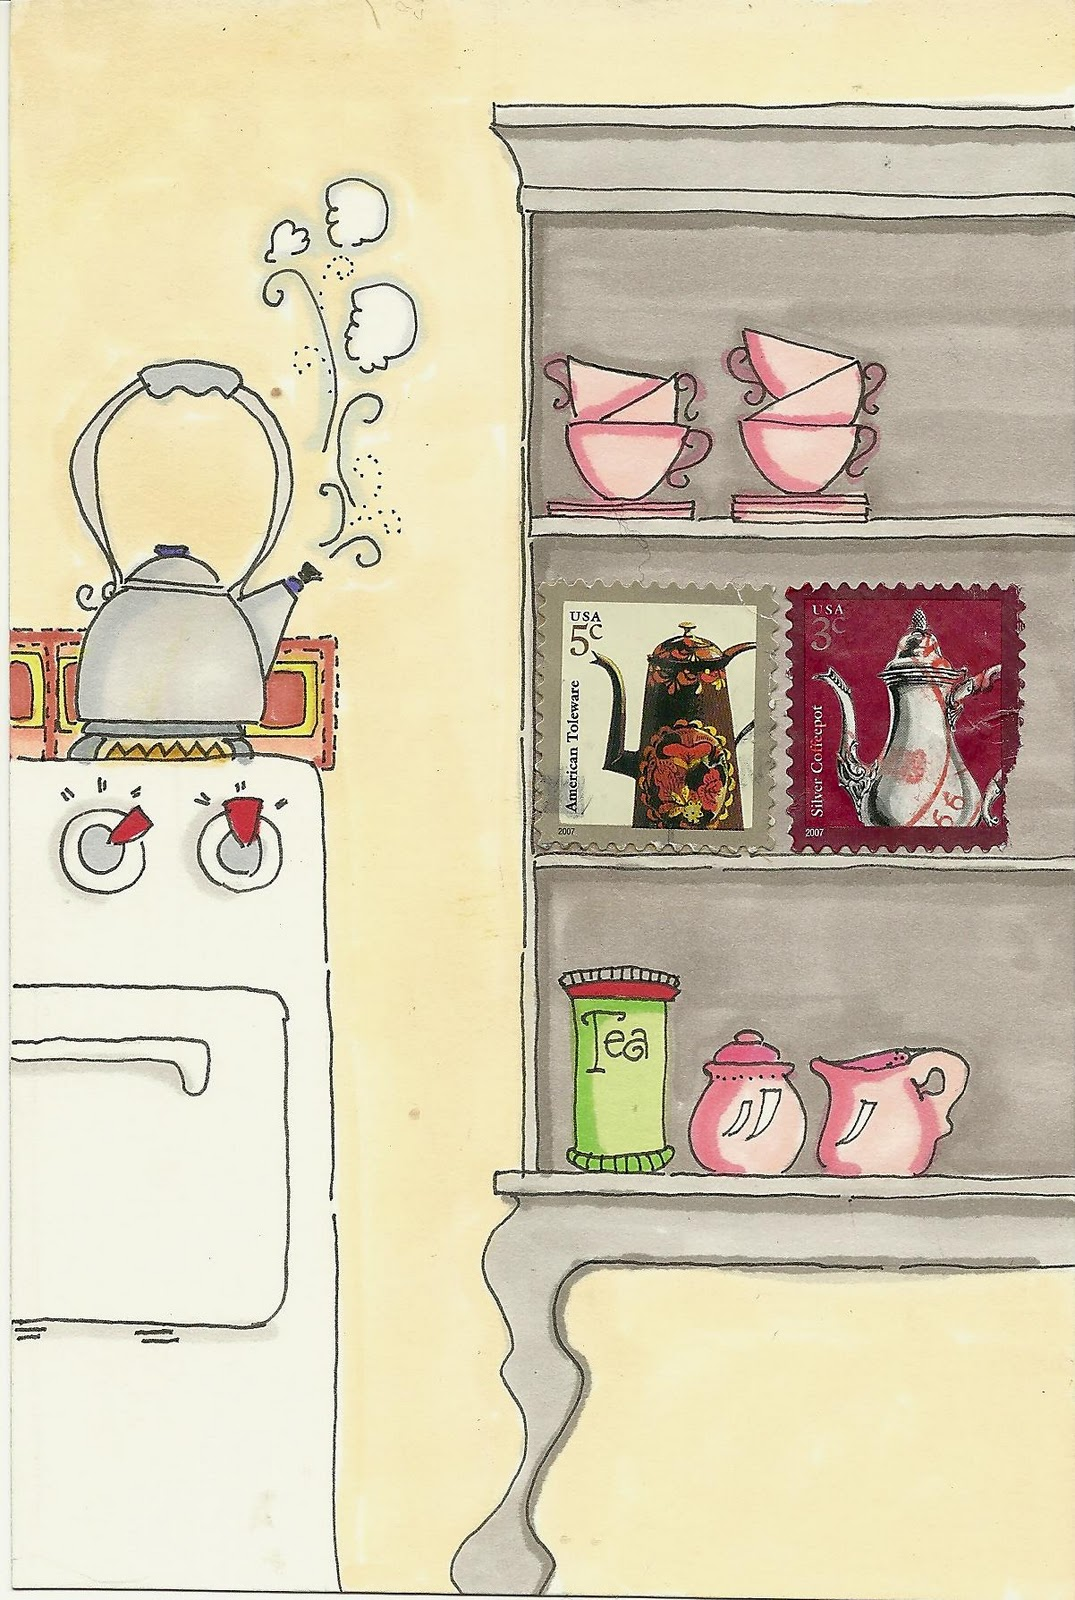 http://1.bp.blogspot.com/_ILP2nJL0yR8/TOL9oEChmBI/AAAAAAAAA6s/feDZzqRzReI/s1600/4x6+teapots.jpeg